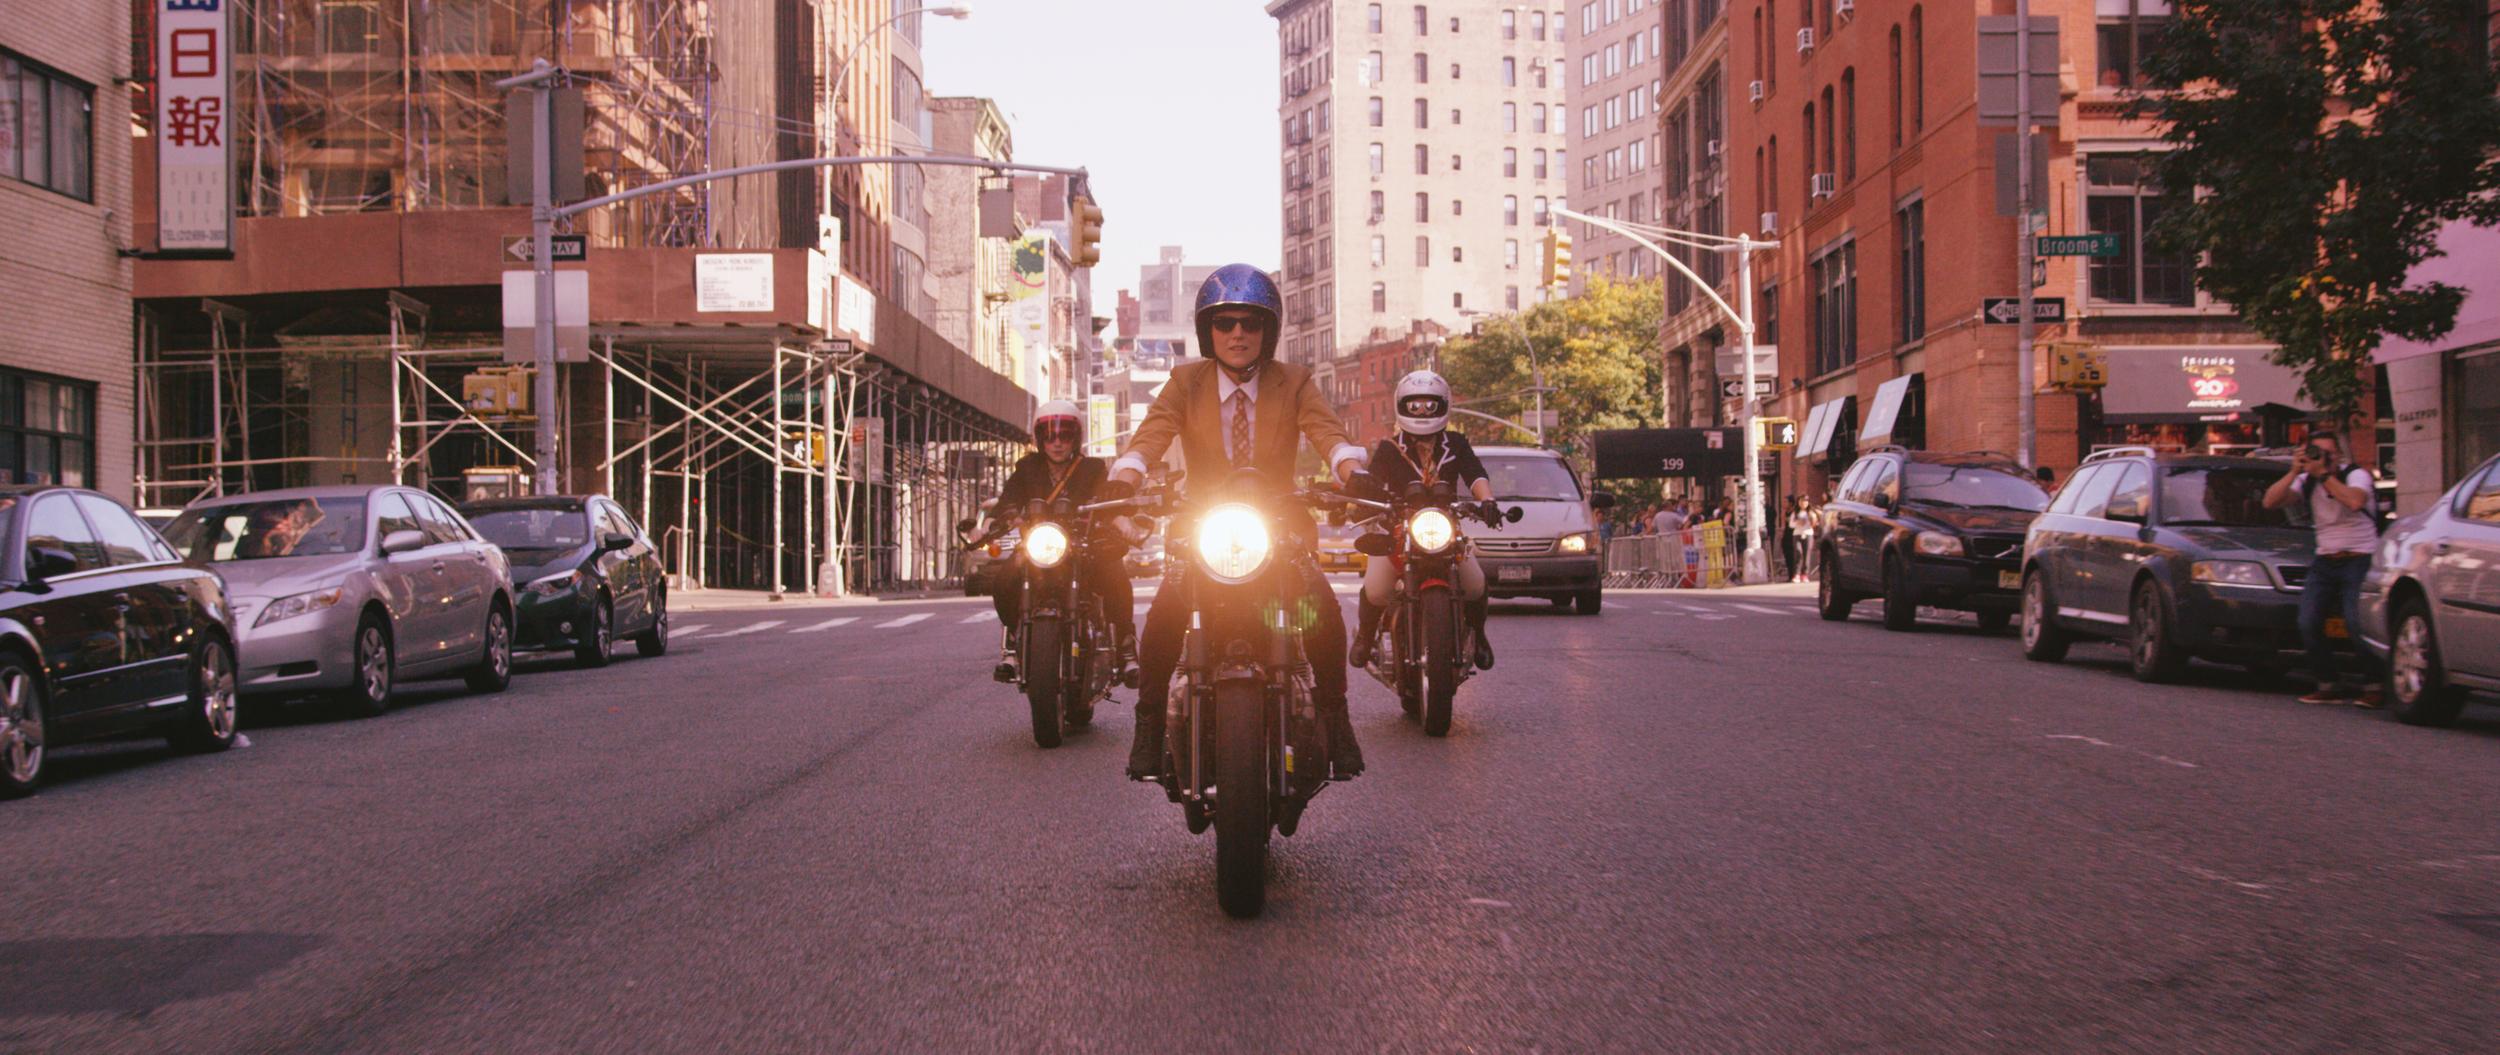 Stories_of_Bike_Discovery_3.jpg